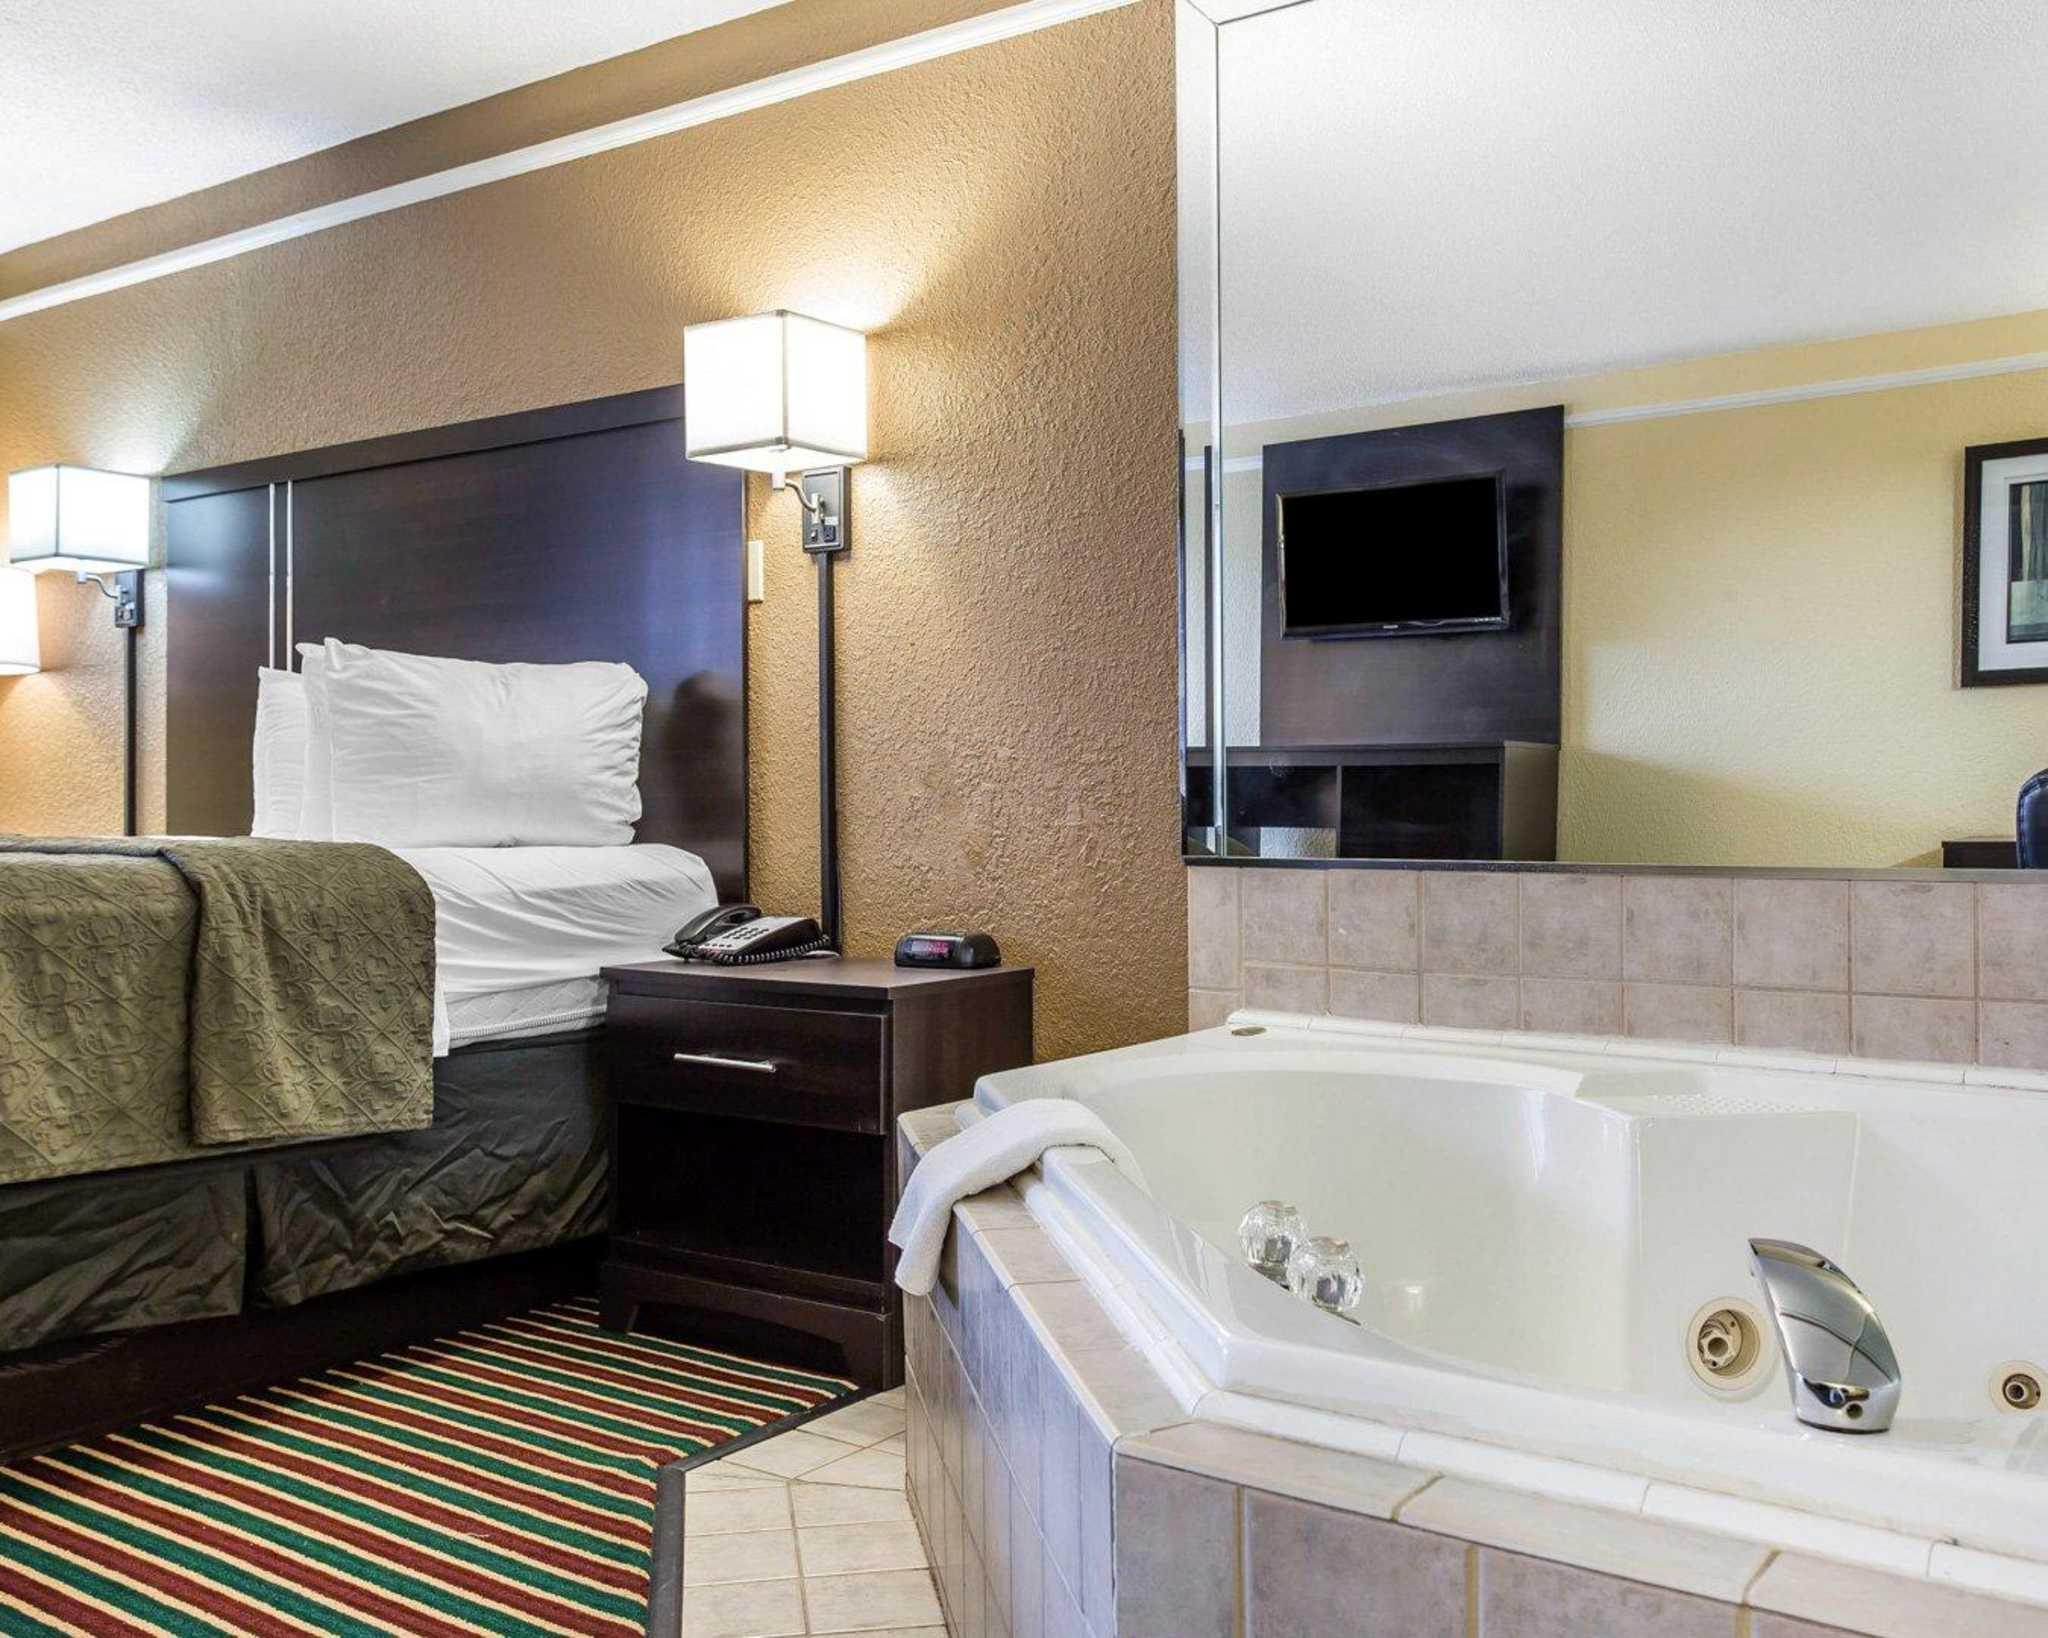 Quality Inn & Suites image 4